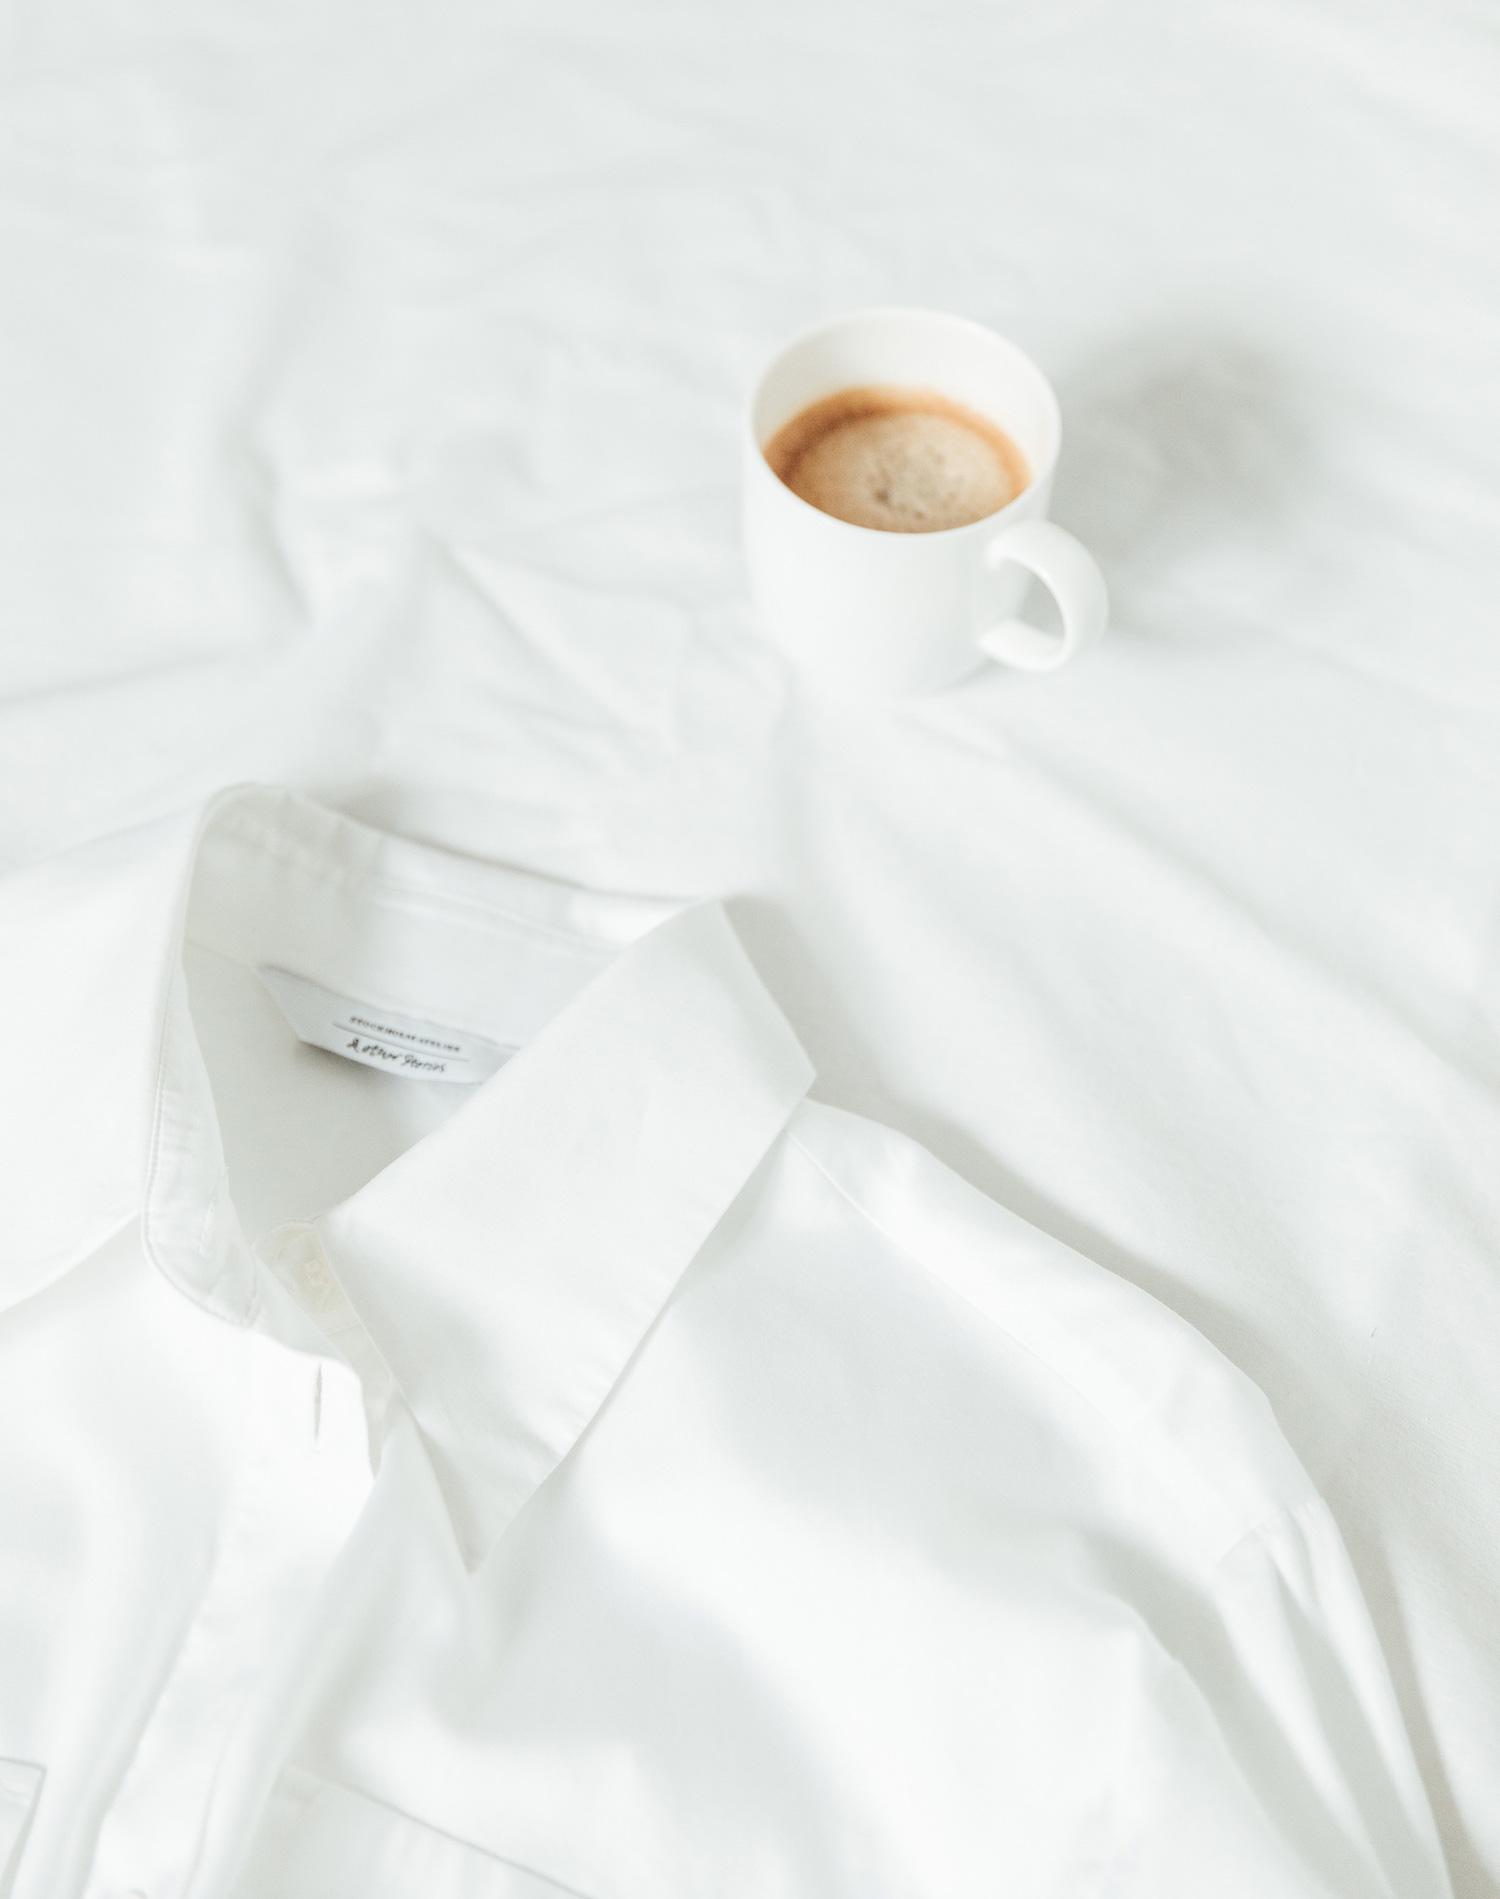 2-white-shirt-and-coffee.jpg